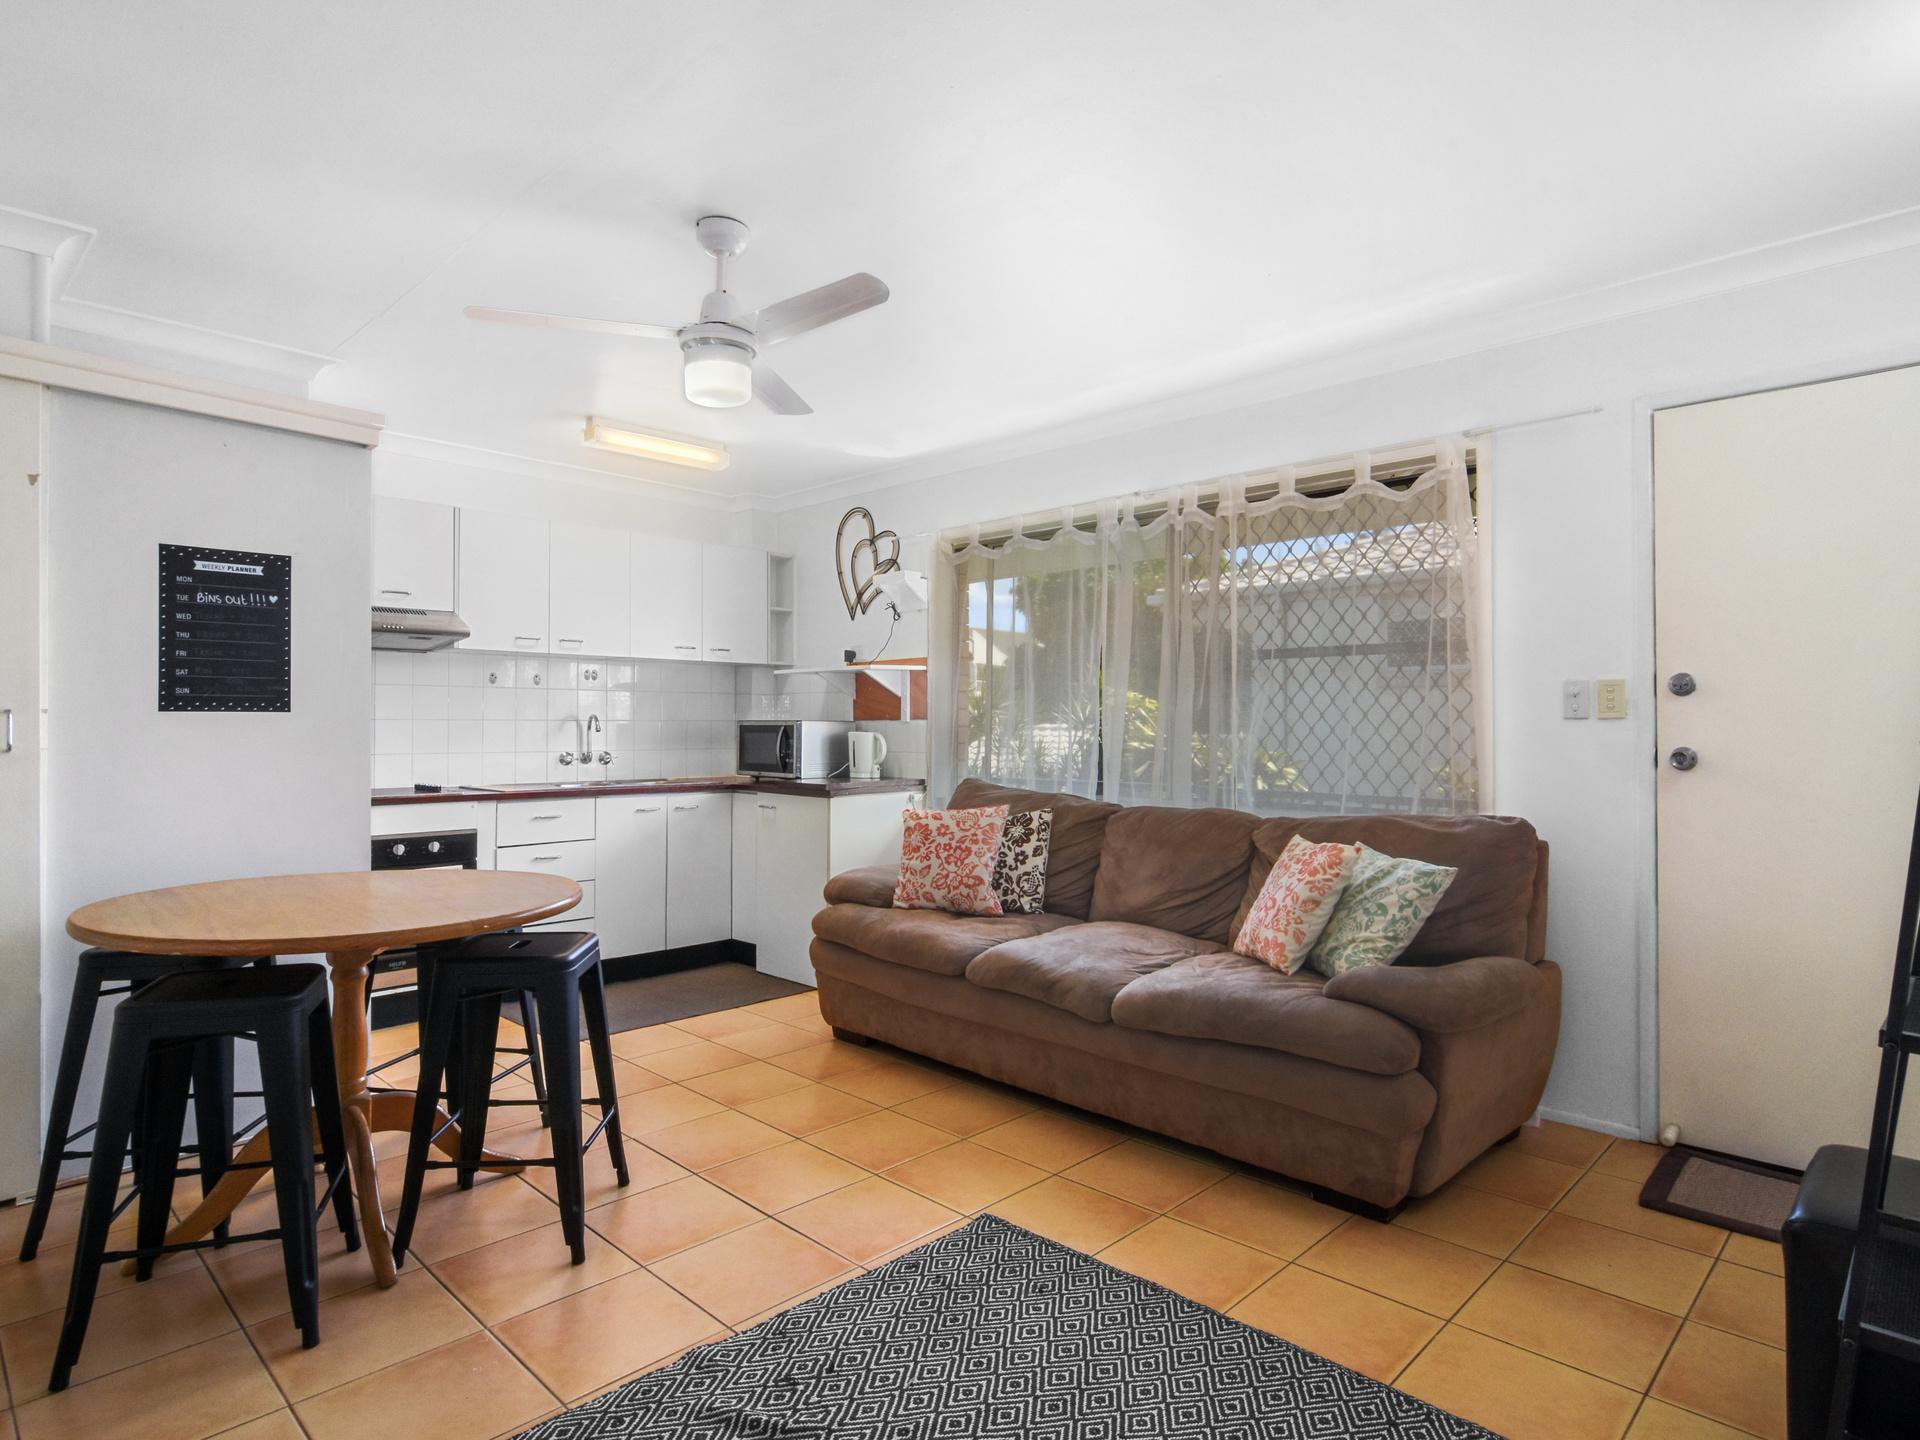 Real Estate | Gold Coast | Chevron Realty | 003 Open2view Id532048 4 35 Darrambal Street Chevron Island